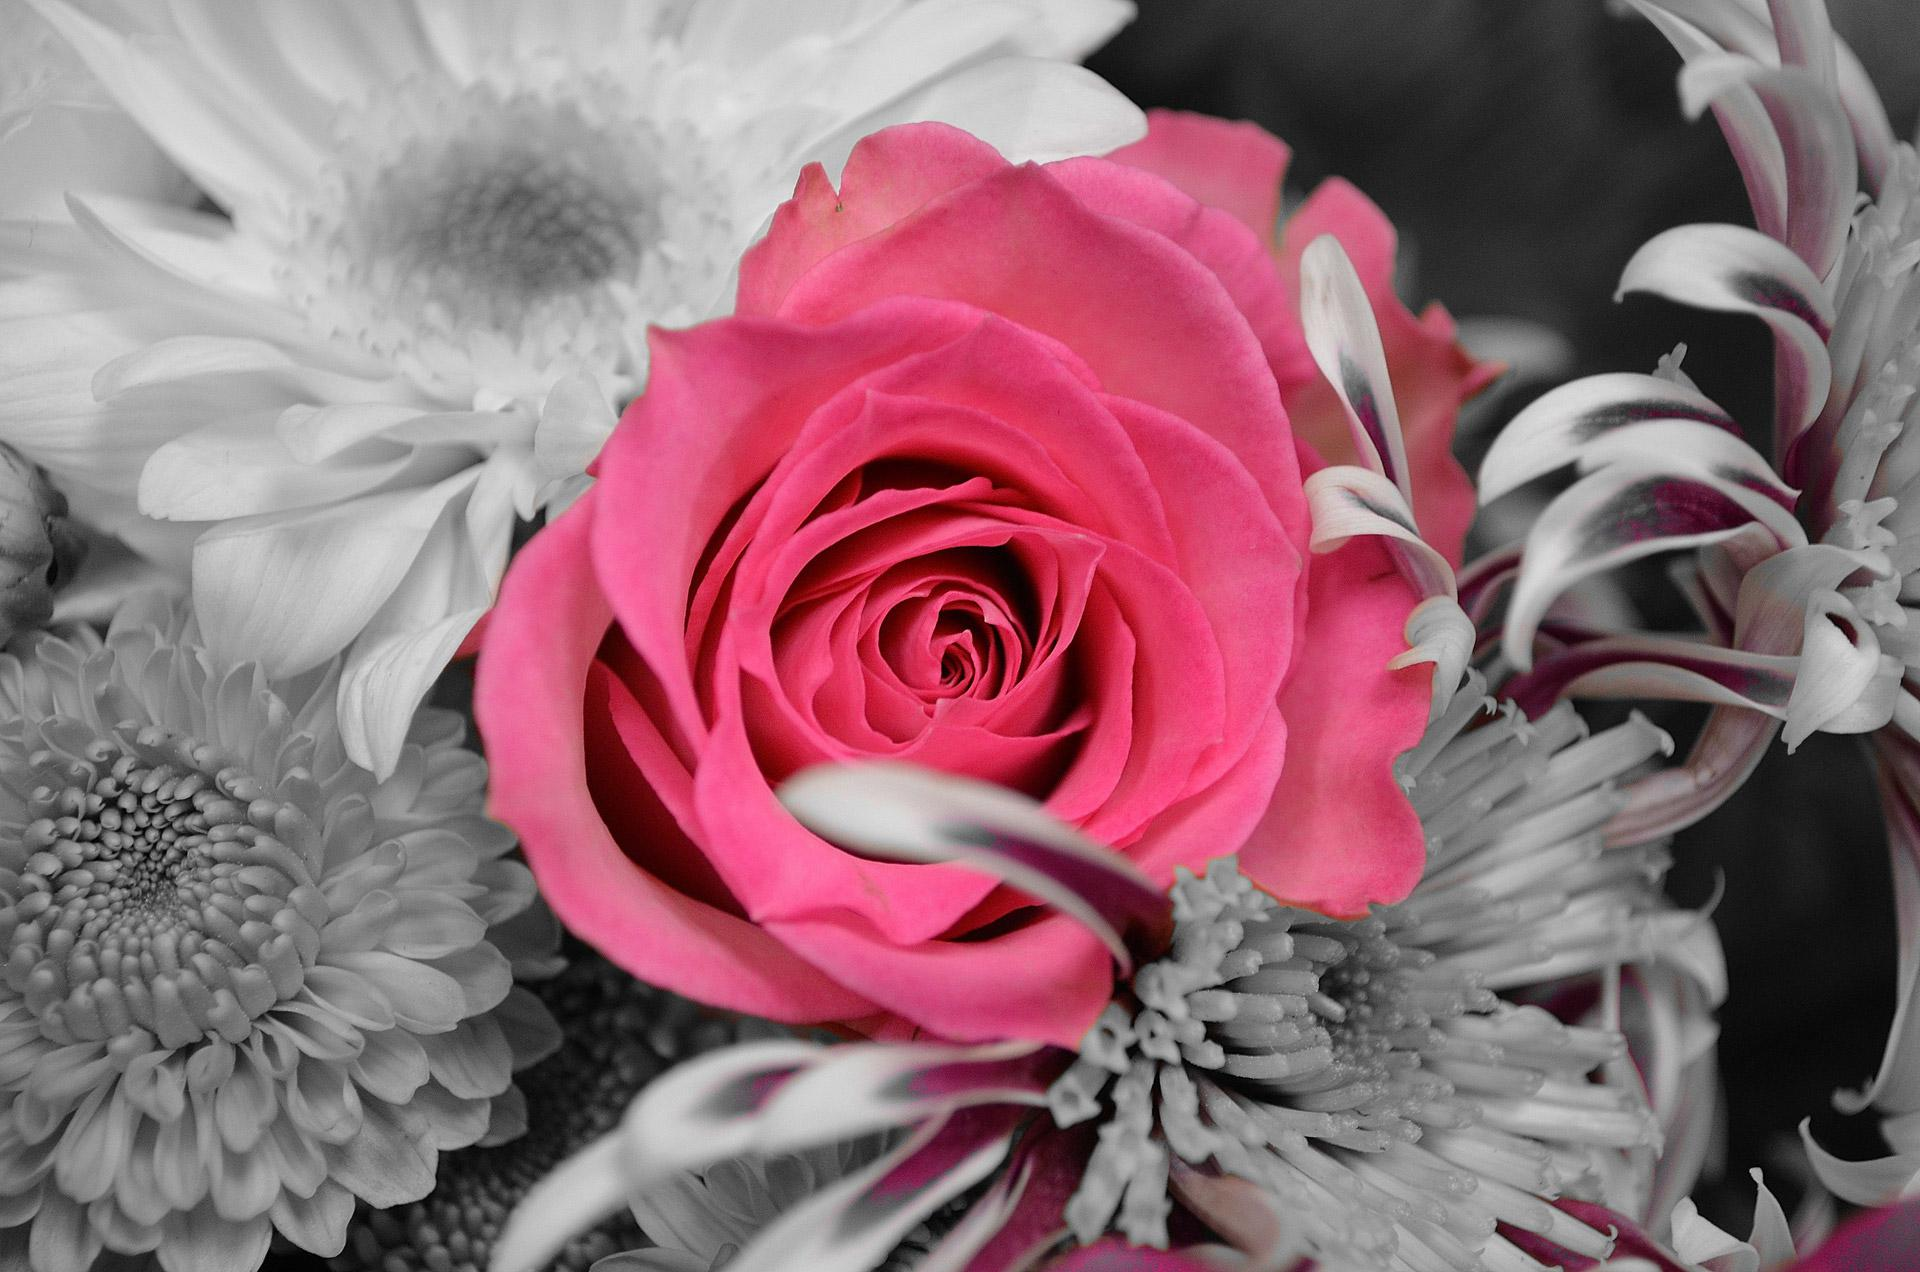 1920x1272px pink and black flower wallpaper wallpapersafari pink and black flowers 90959 high quality and resolution 1920x1272 mightylinksfo